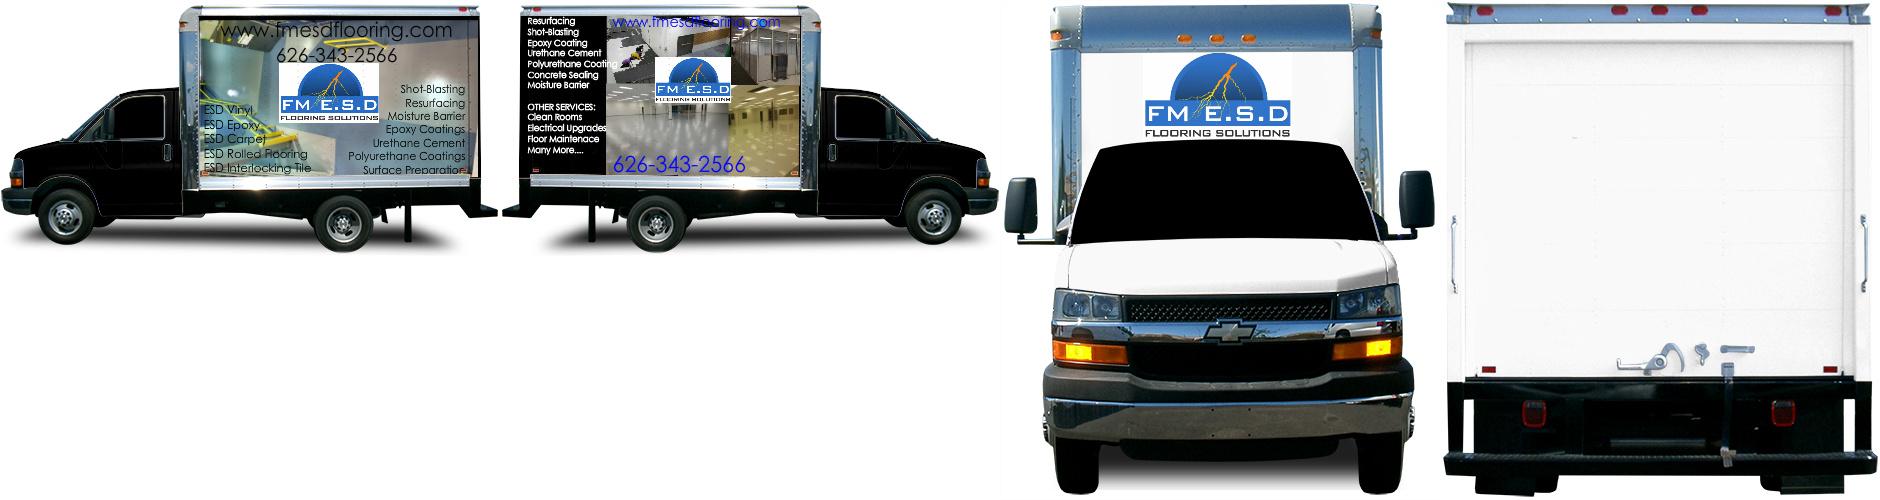 Box Truck Wrap #50465